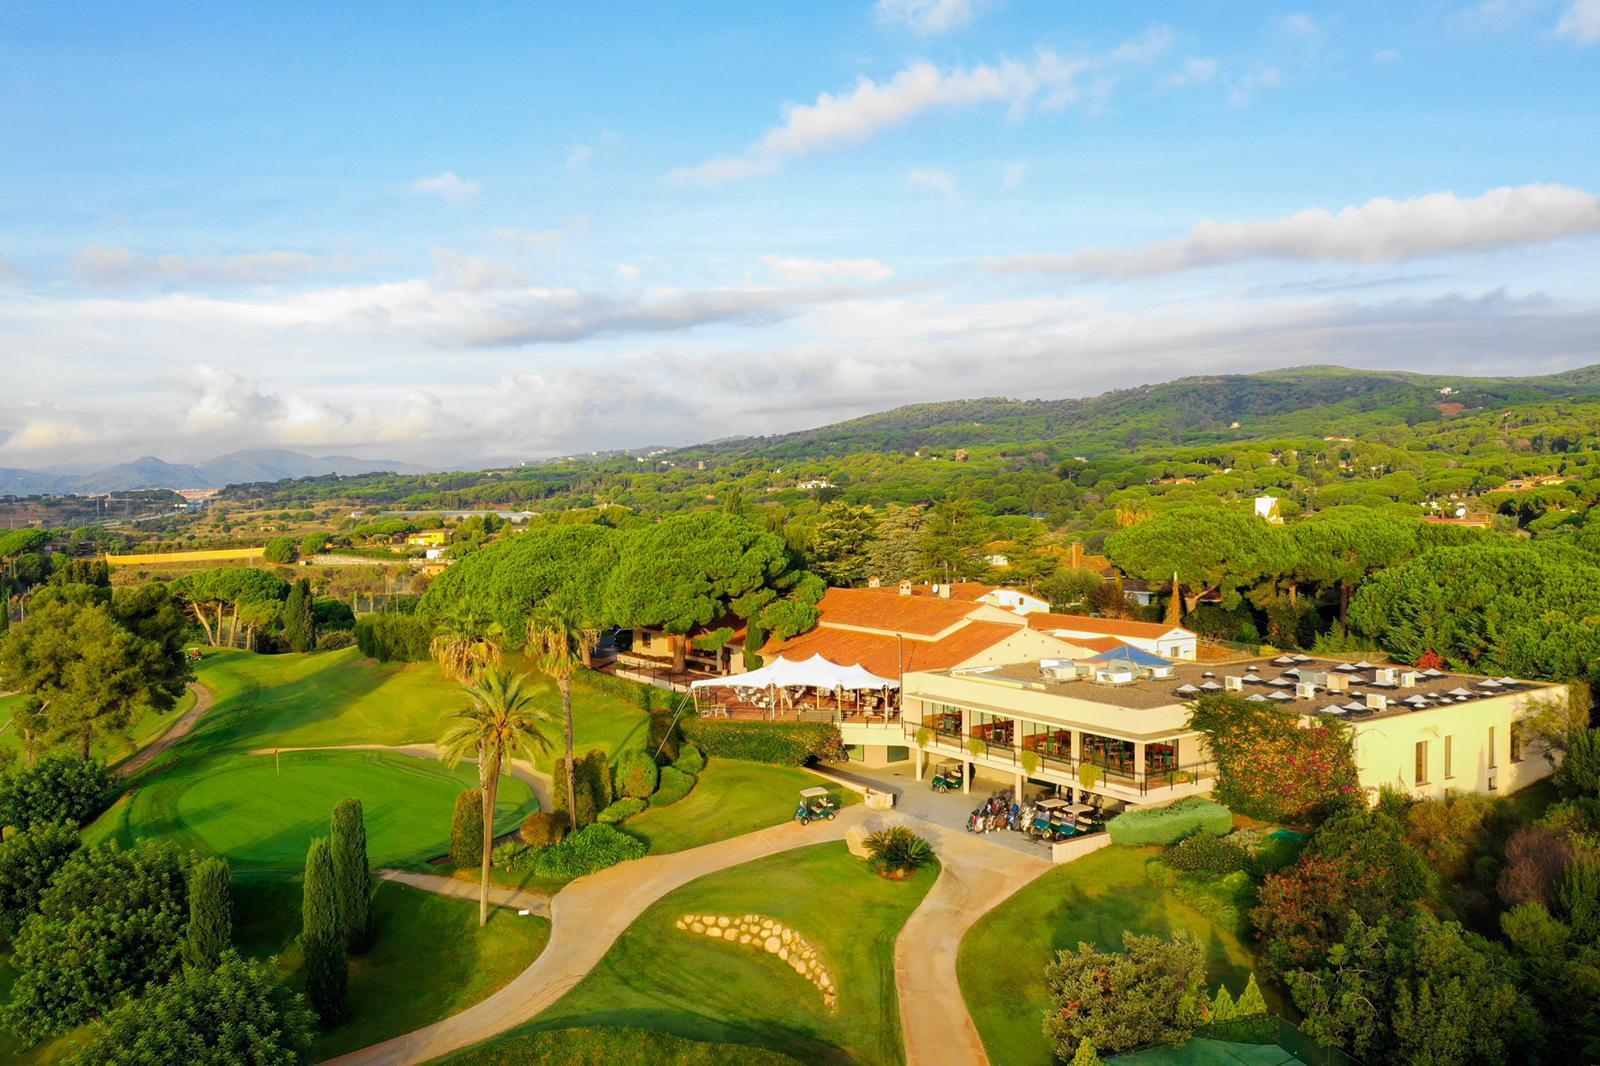 Club de Golf Llavaneras